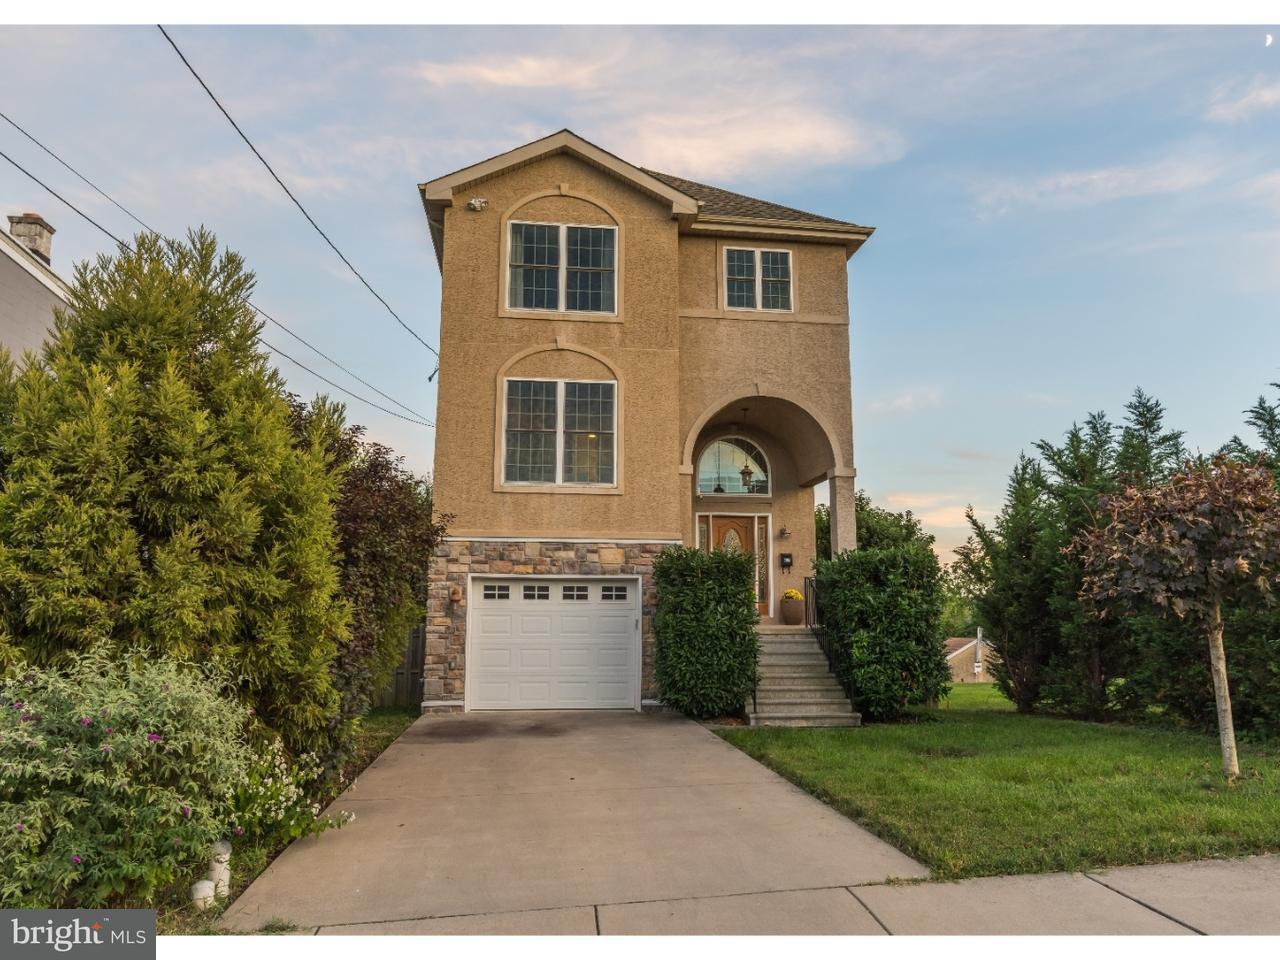 Single Family Home for Sale at 406 JEFFERSON Street Bridgeport, Pennsylvania 19405 United States